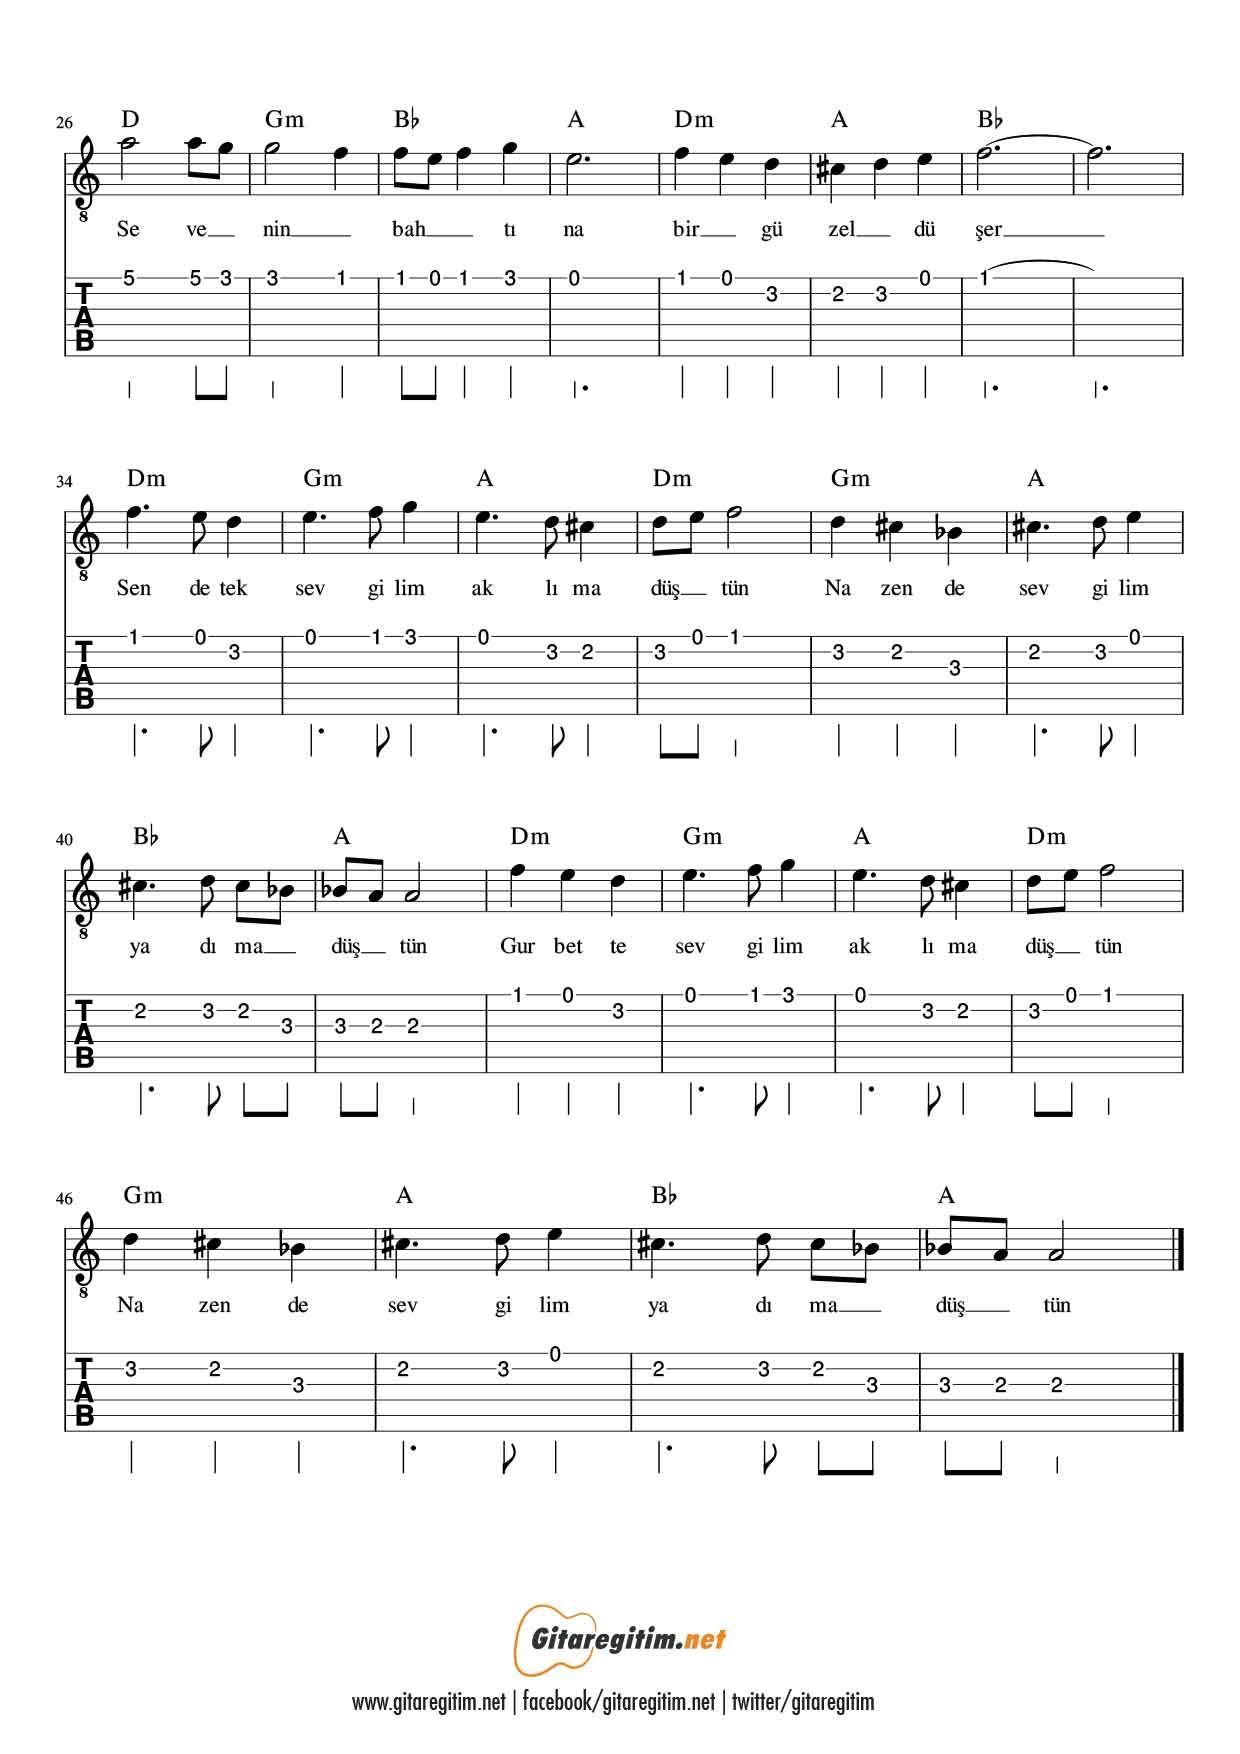 Nazende Sevgilim Gitar Nota Tab Gitaregitim Net 2020 Gitar Notalara Dokulmus Muzik Muzik Notalari